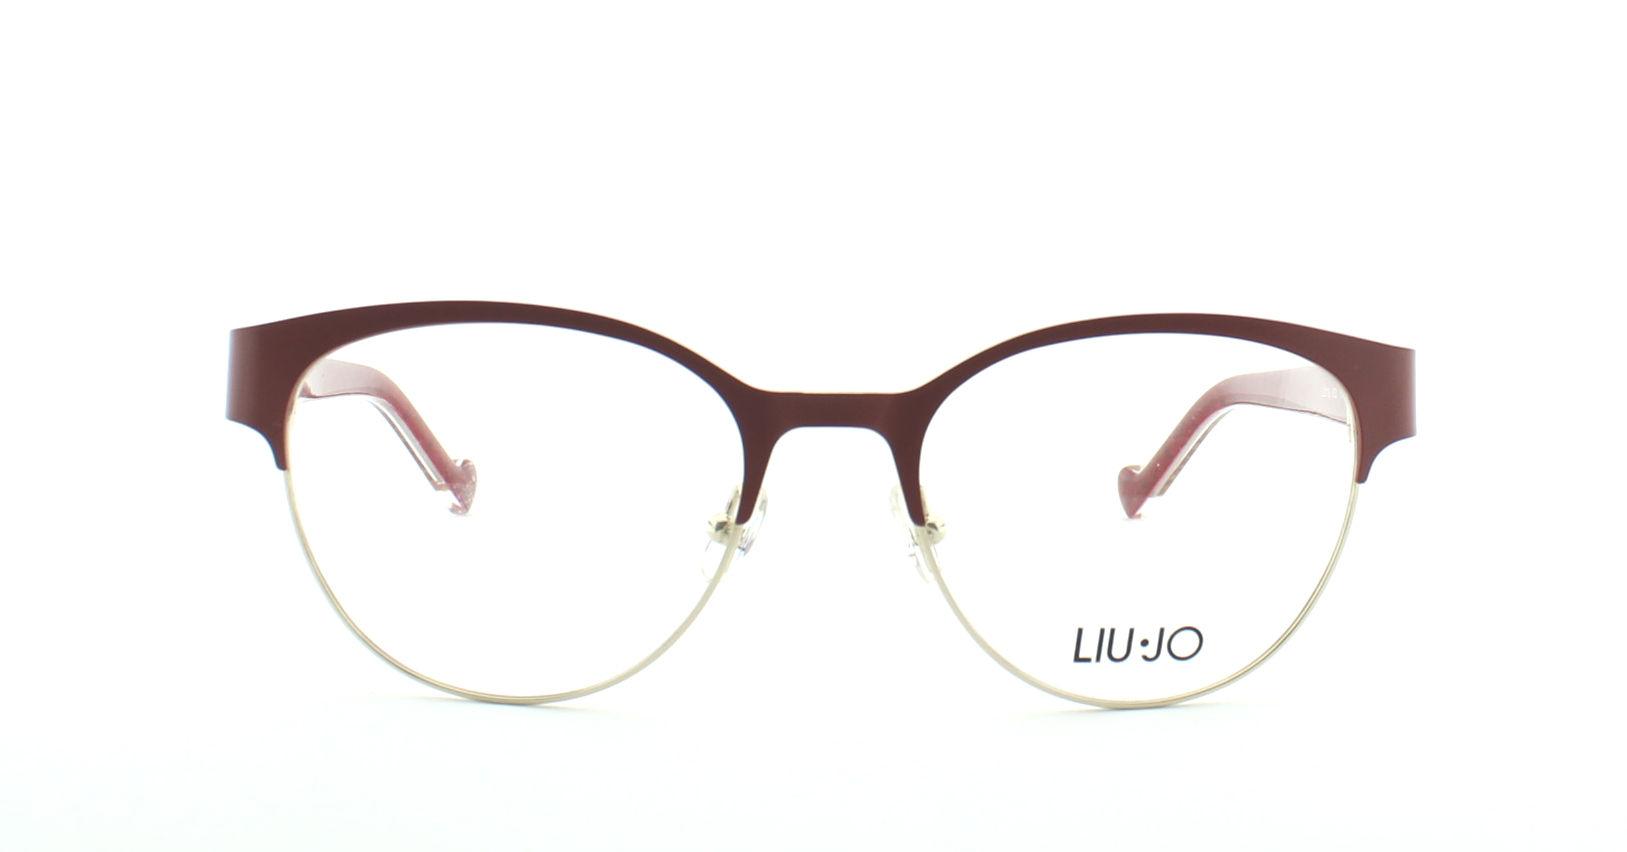 LIU-JO model 2112 col.620